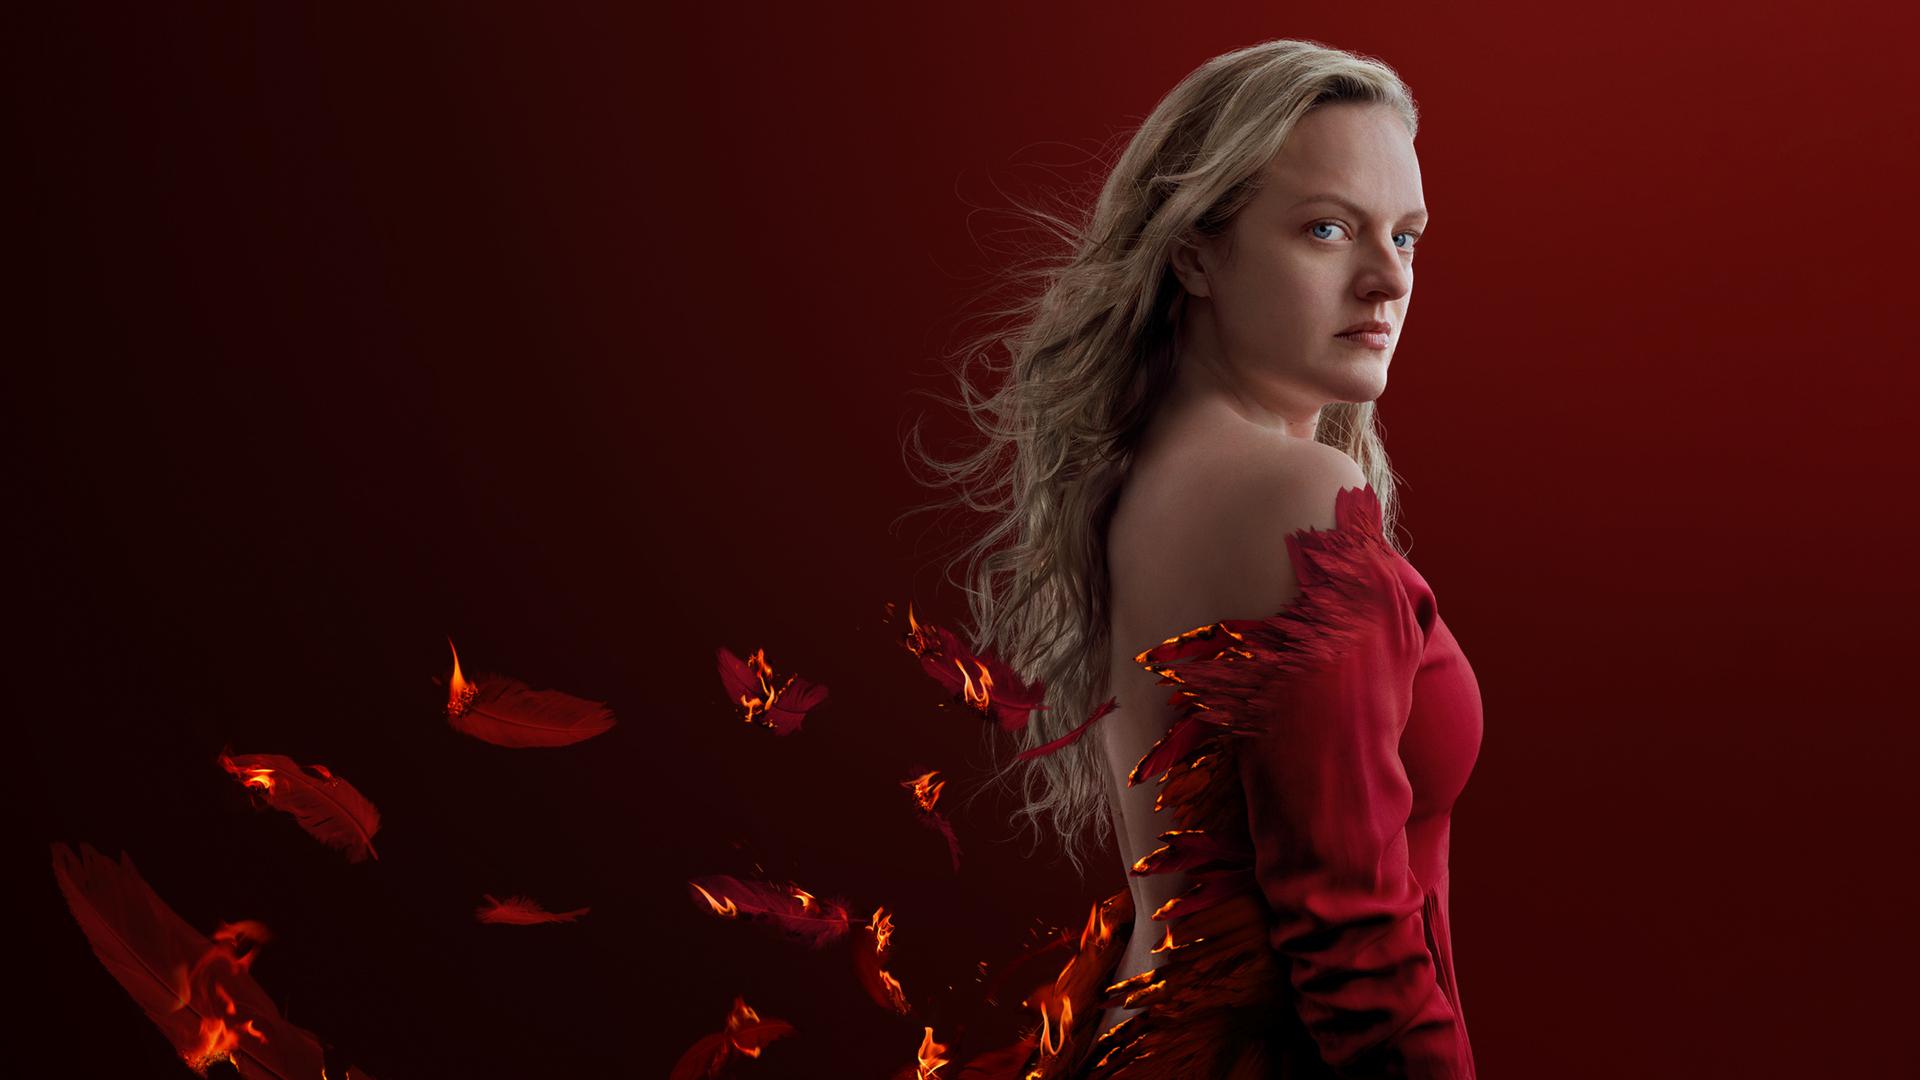 Prime Video: The Handmaid's Tale (Season 4)